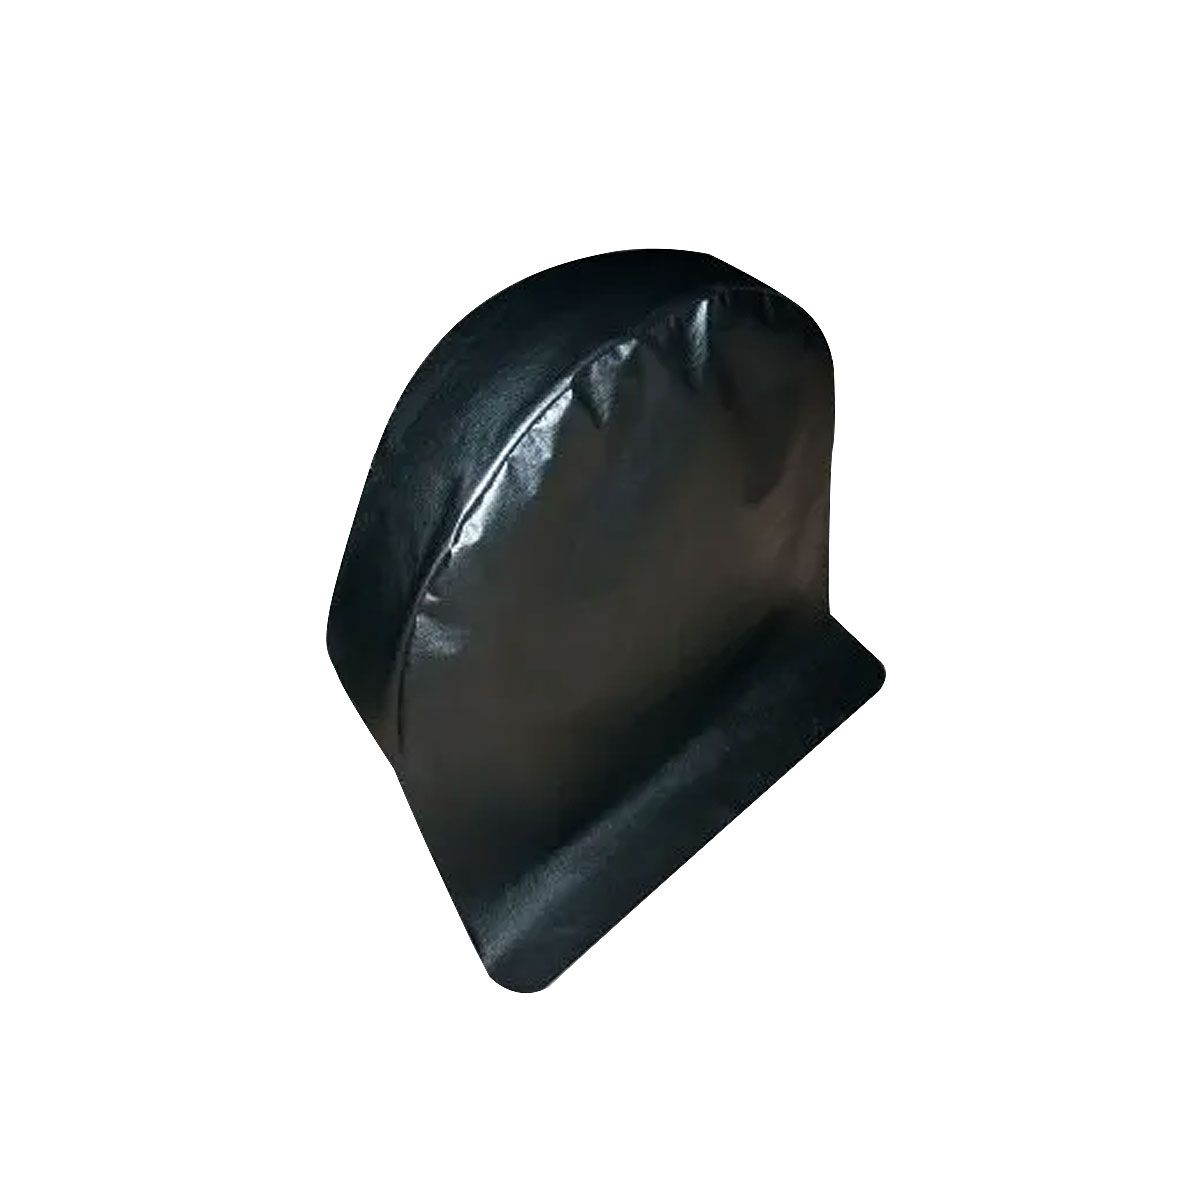 Capa Para Roda - Protetora Anti Xixi - Aro 16 E 17